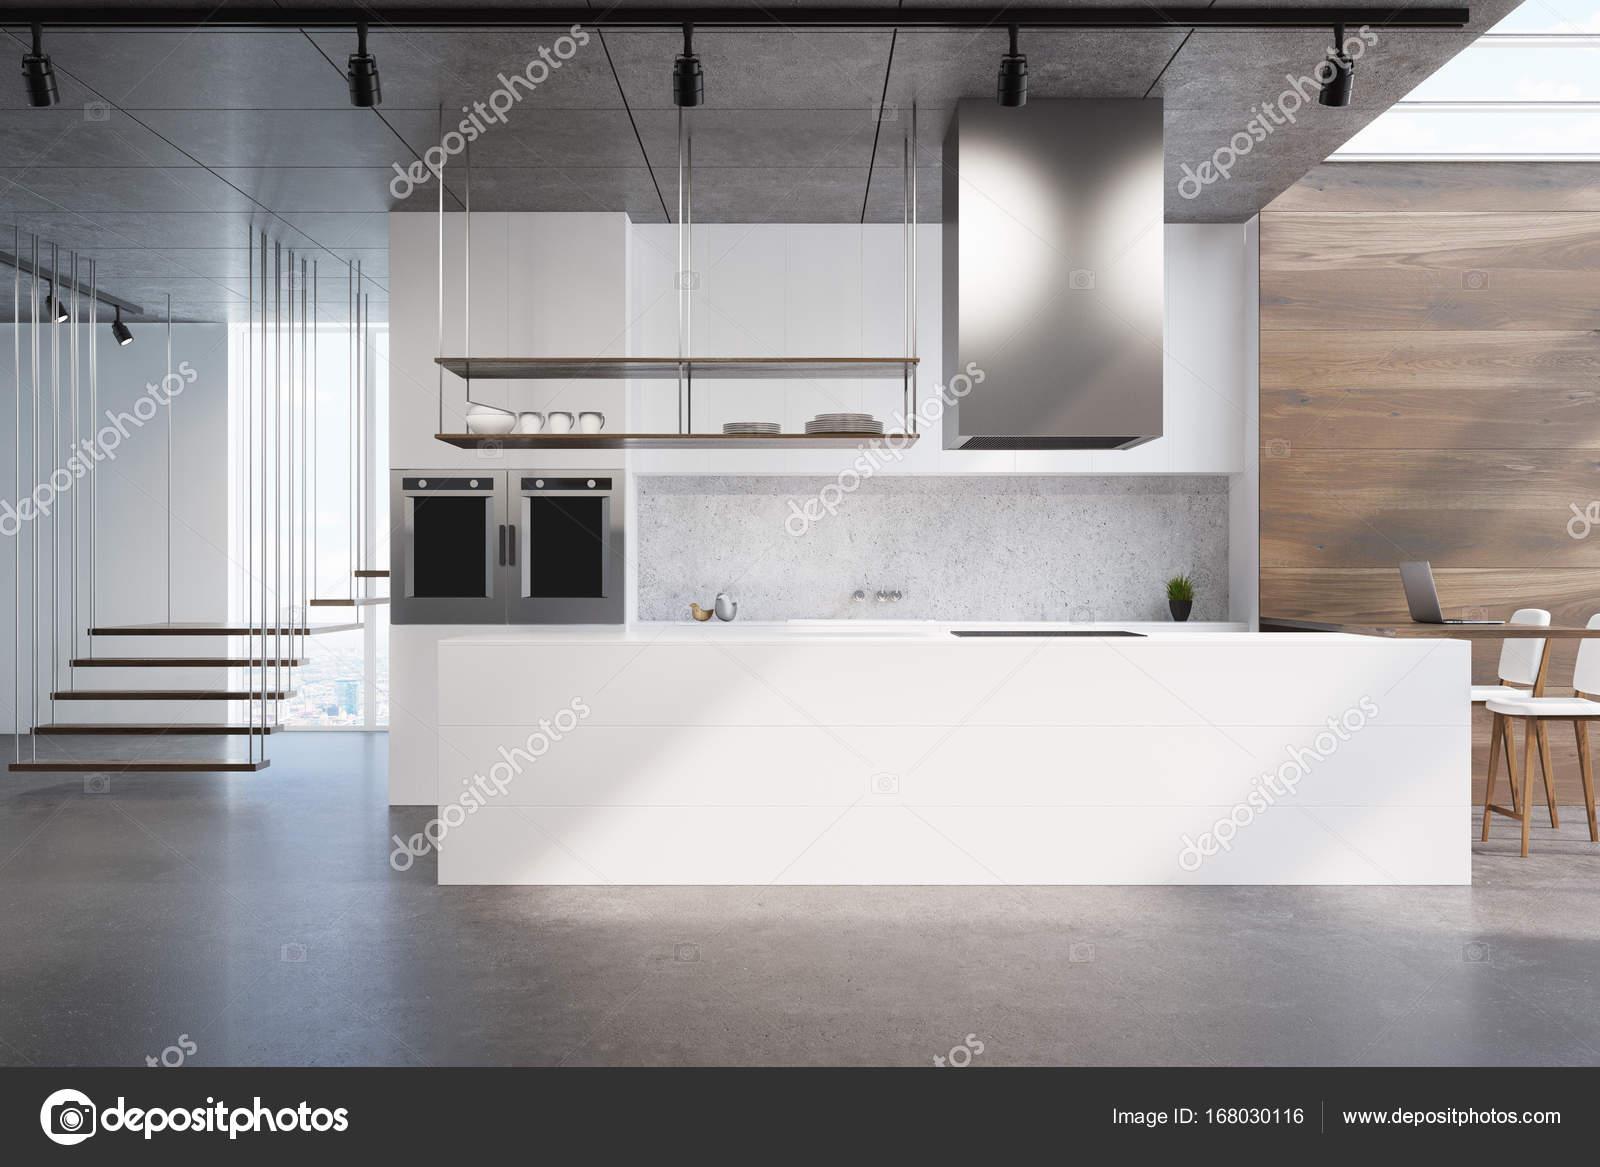 Houten Keuken Beton : Witte keuken teller hout en beton u stockfoto denisismagilov